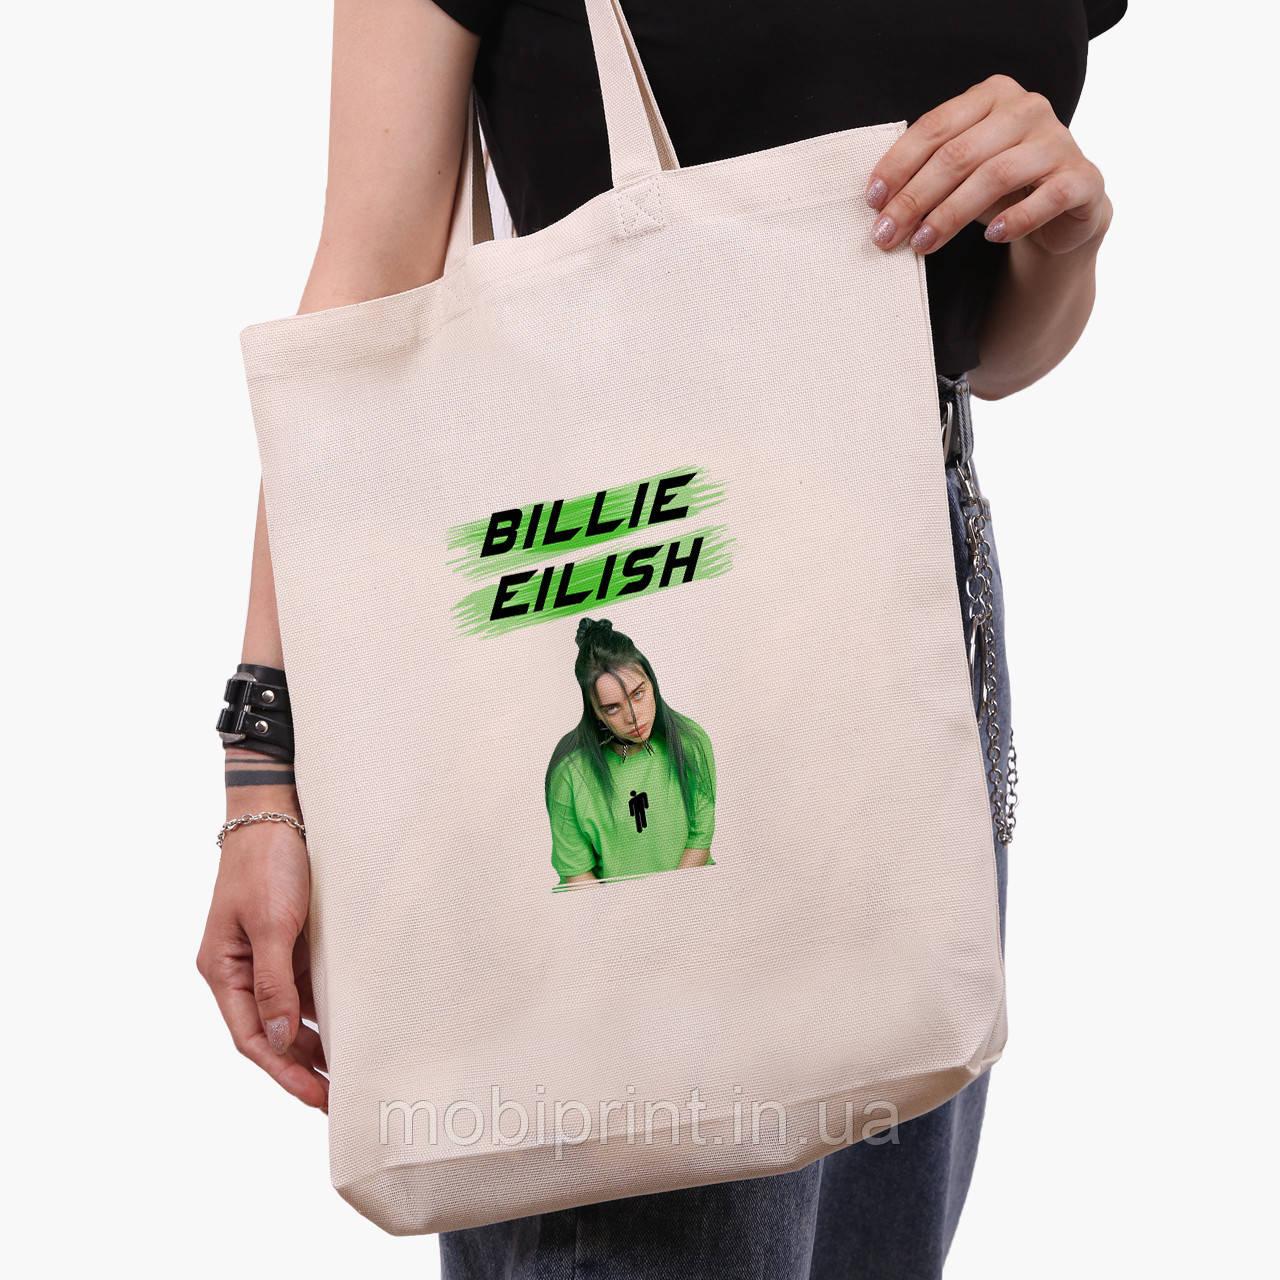 Еко сумка шоппер біла Біллі Айлиш (Billie Eilish) (9227-1207-1) экосумка шопер 41*39*8 см